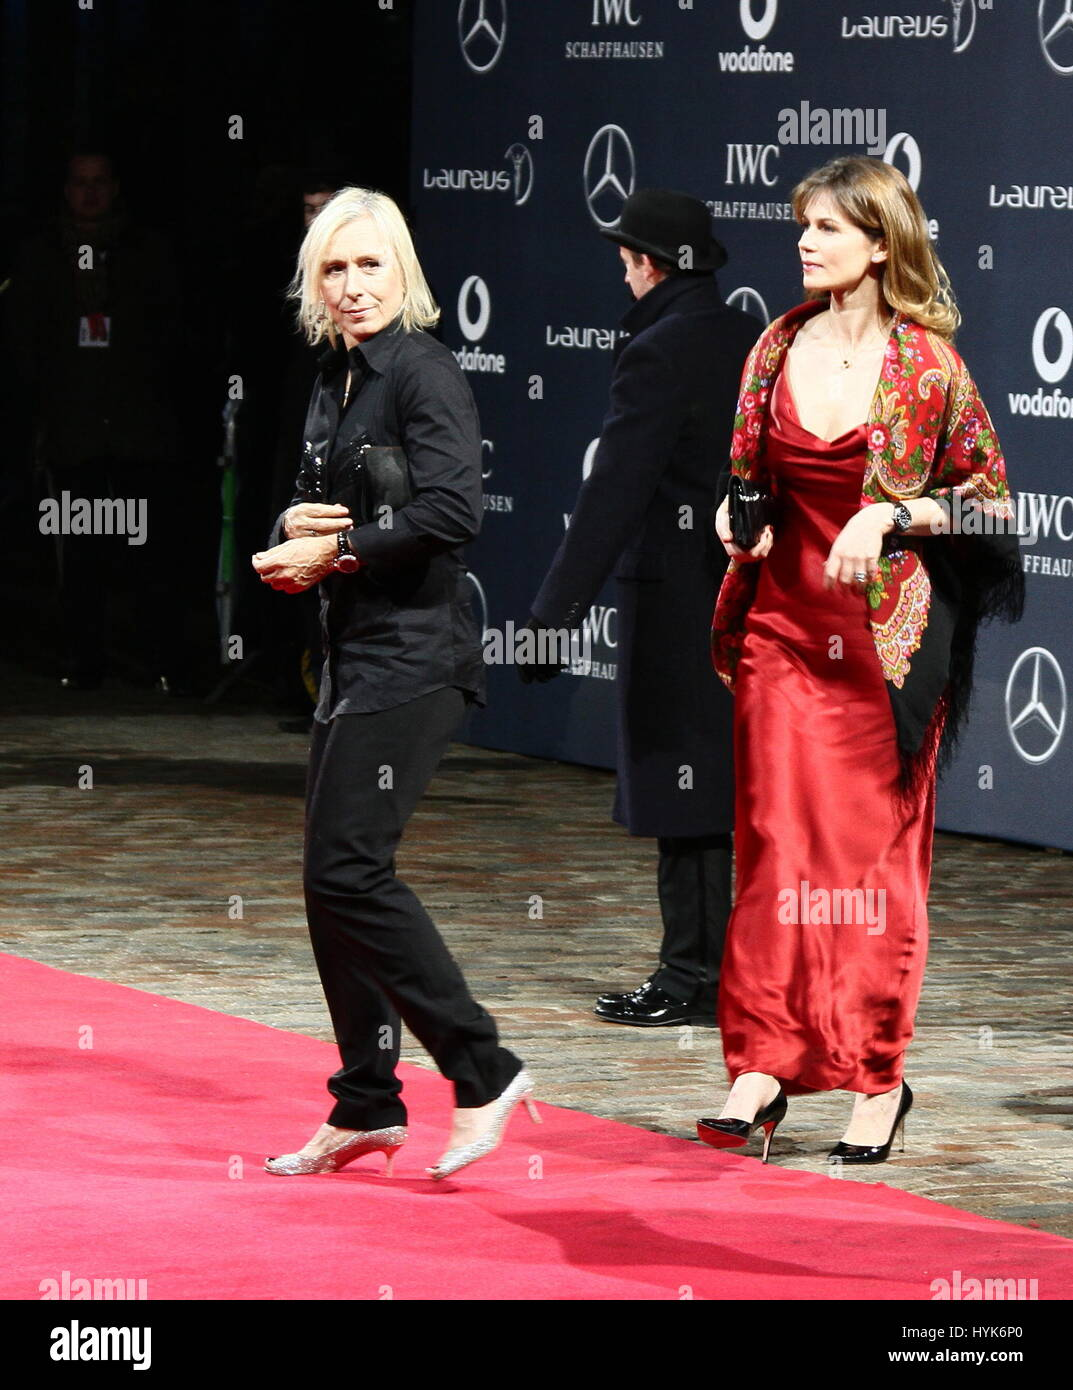 Martina Navratilova and Julia Lemigova arriving at a sports award evening in Westminster, London, UK. - Stock Image